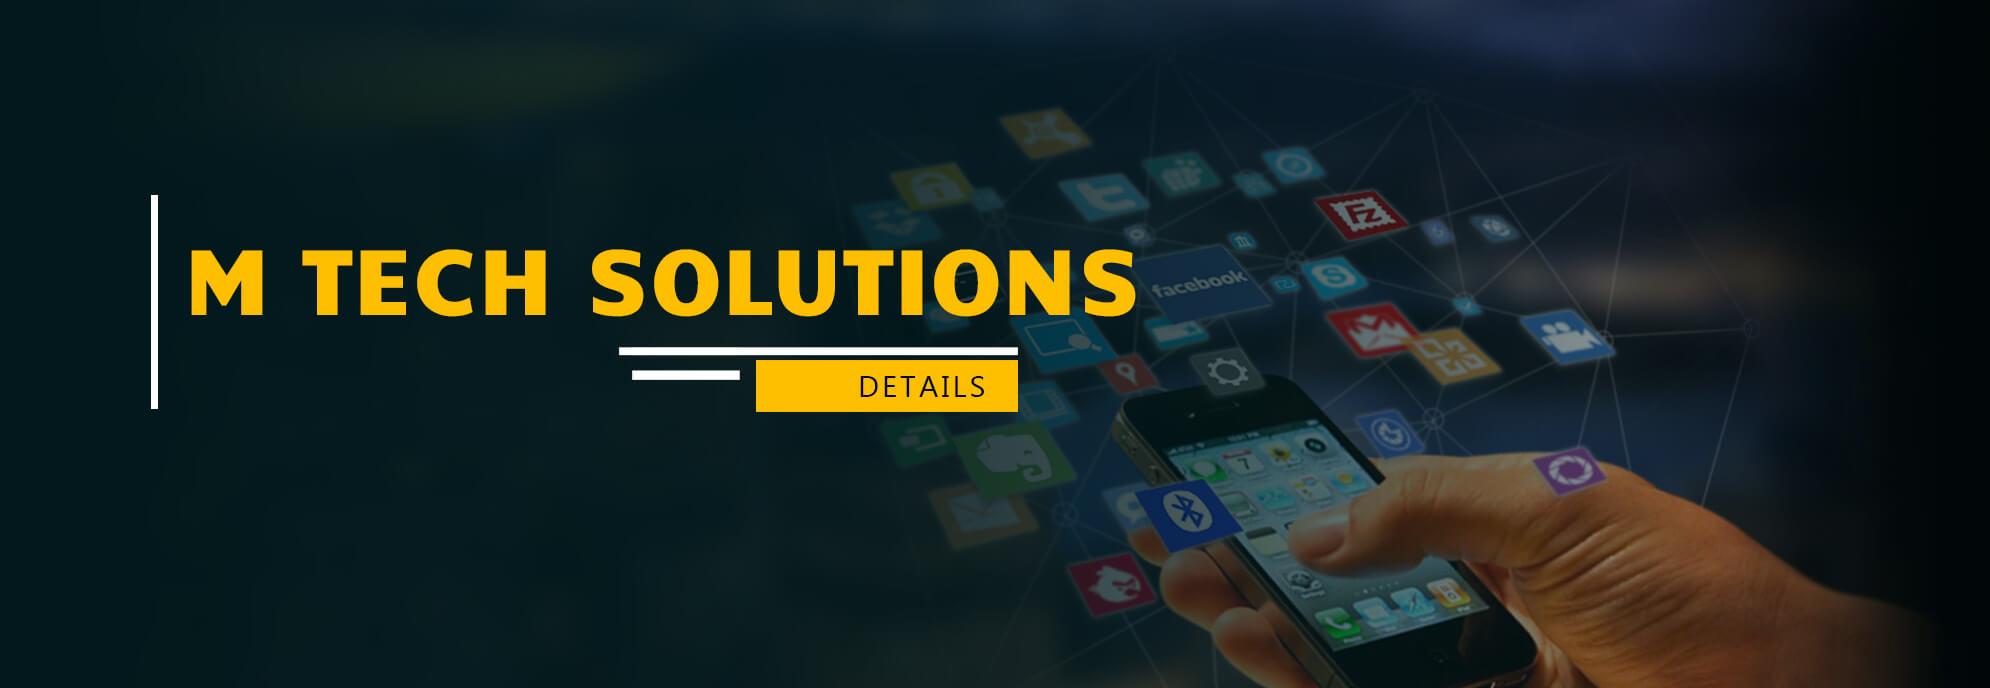 Mehboob Tech Solutions